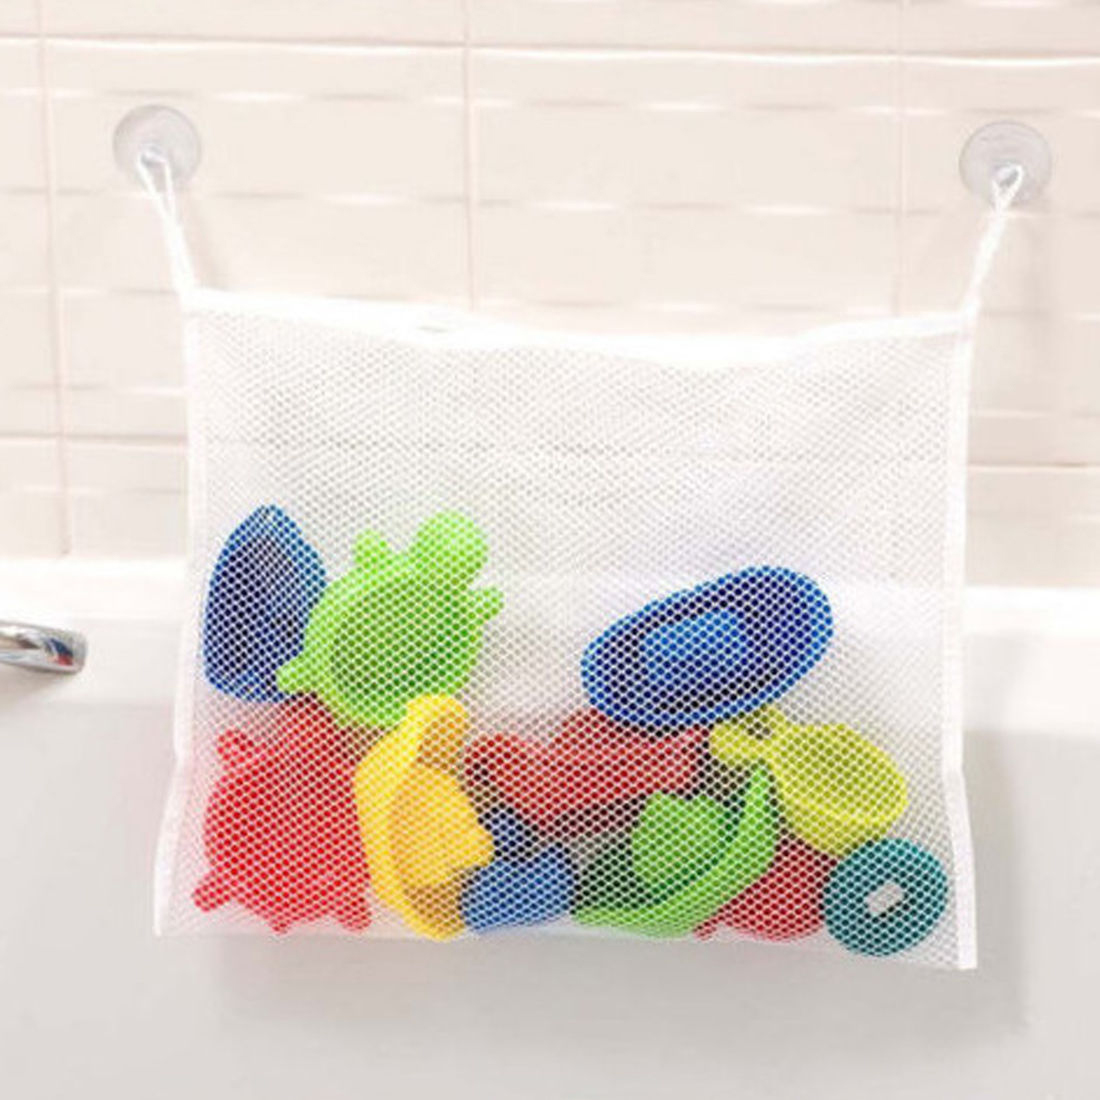 Retail Creative Bathroom Mesh Net Storage Bag Baby Bath Bathtub Toy Mesh Net Storage Bag Organizer Holder For Home